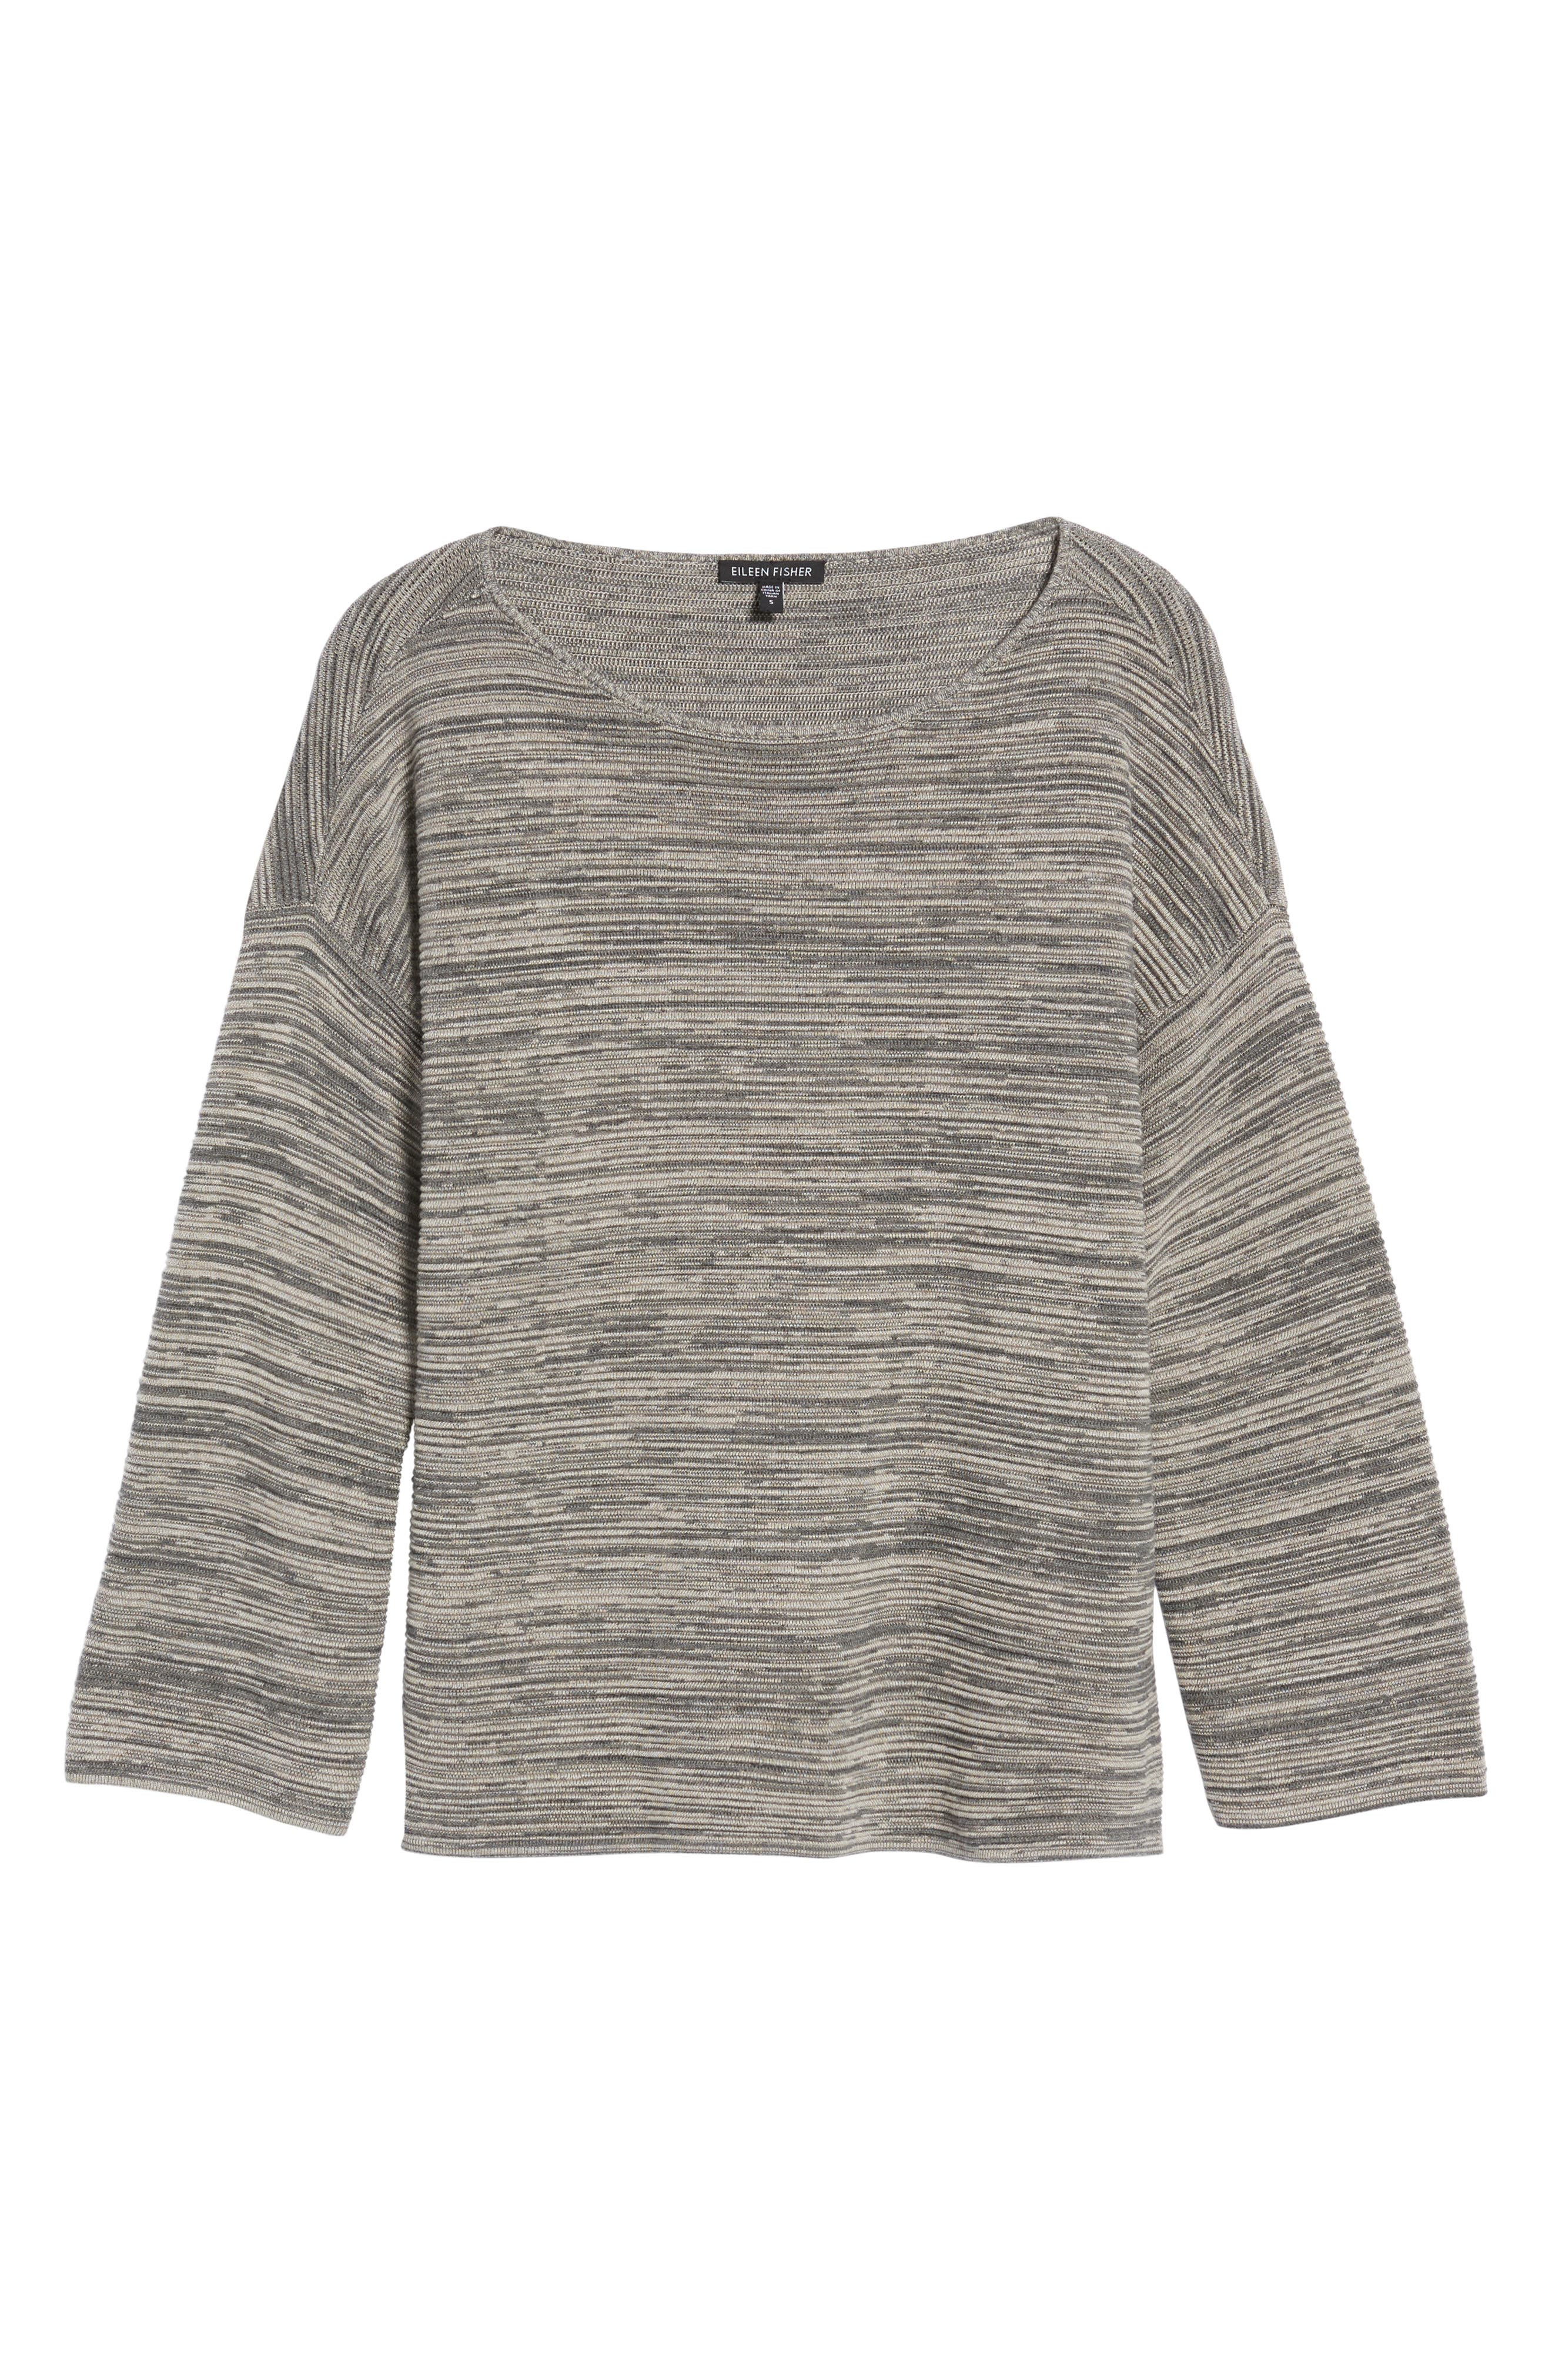 Tencel<sup>®</sup> & Organic Cotton Sweater,                             Alternate thumbnail 6, color,                             Maple Oat